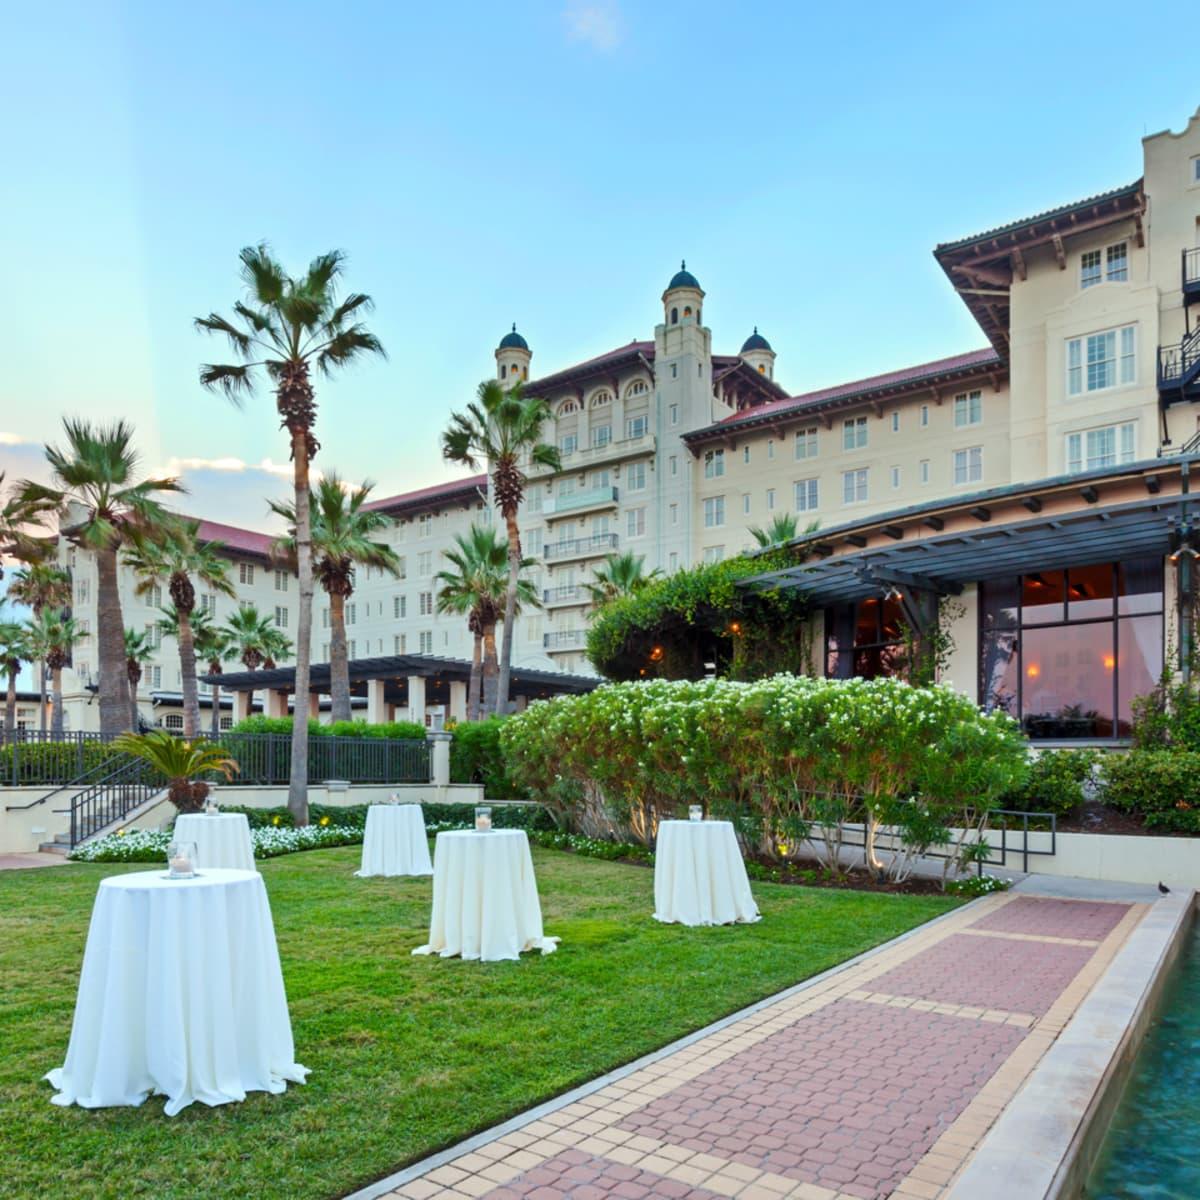 Hotel Galvez Oleander Garden wedding reception